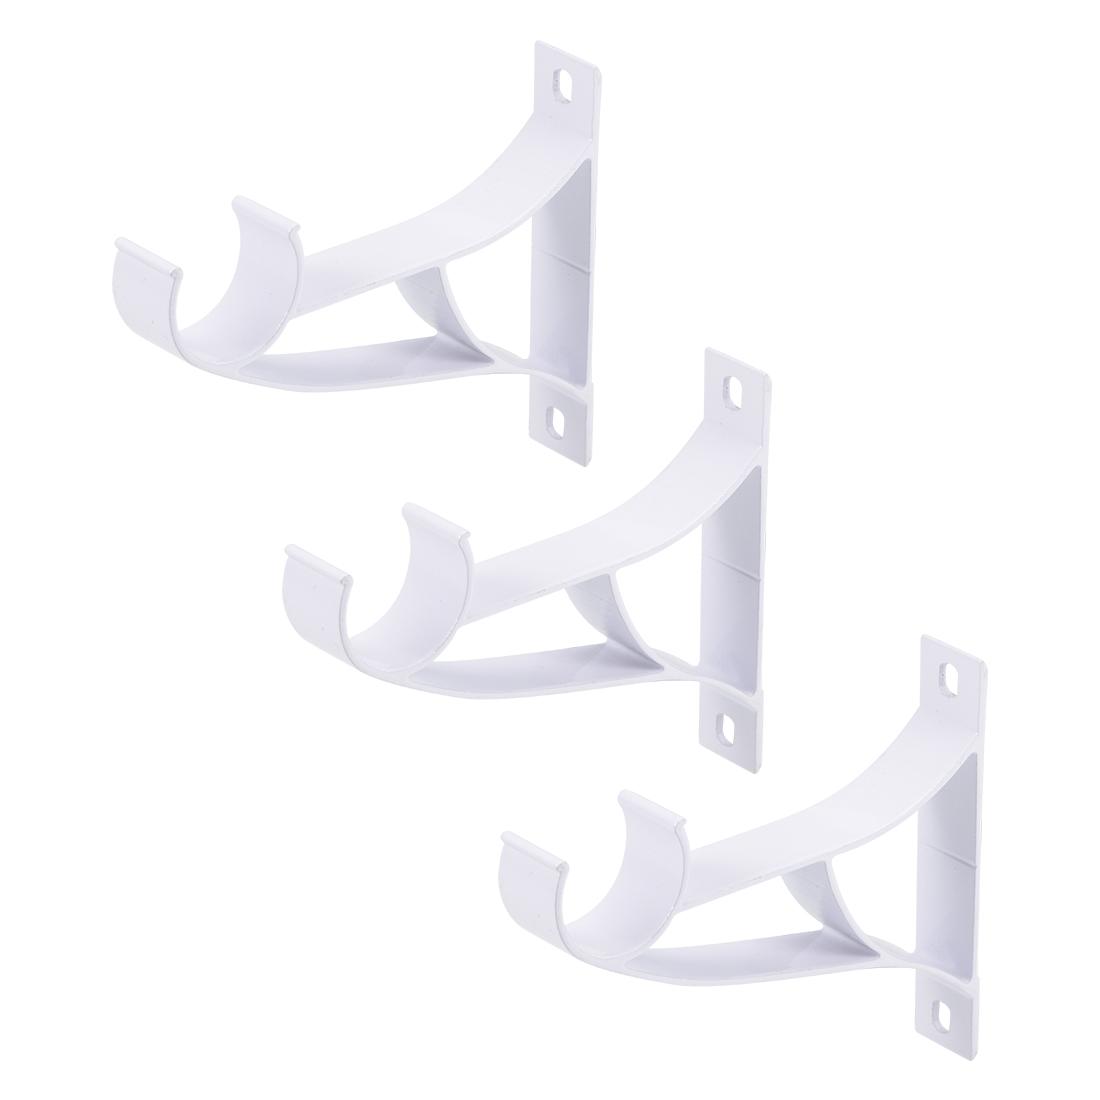 Curtain Rod Bracket Single Holder for 25mm Rod 94 x 80 x 16mm White 3 Pcs